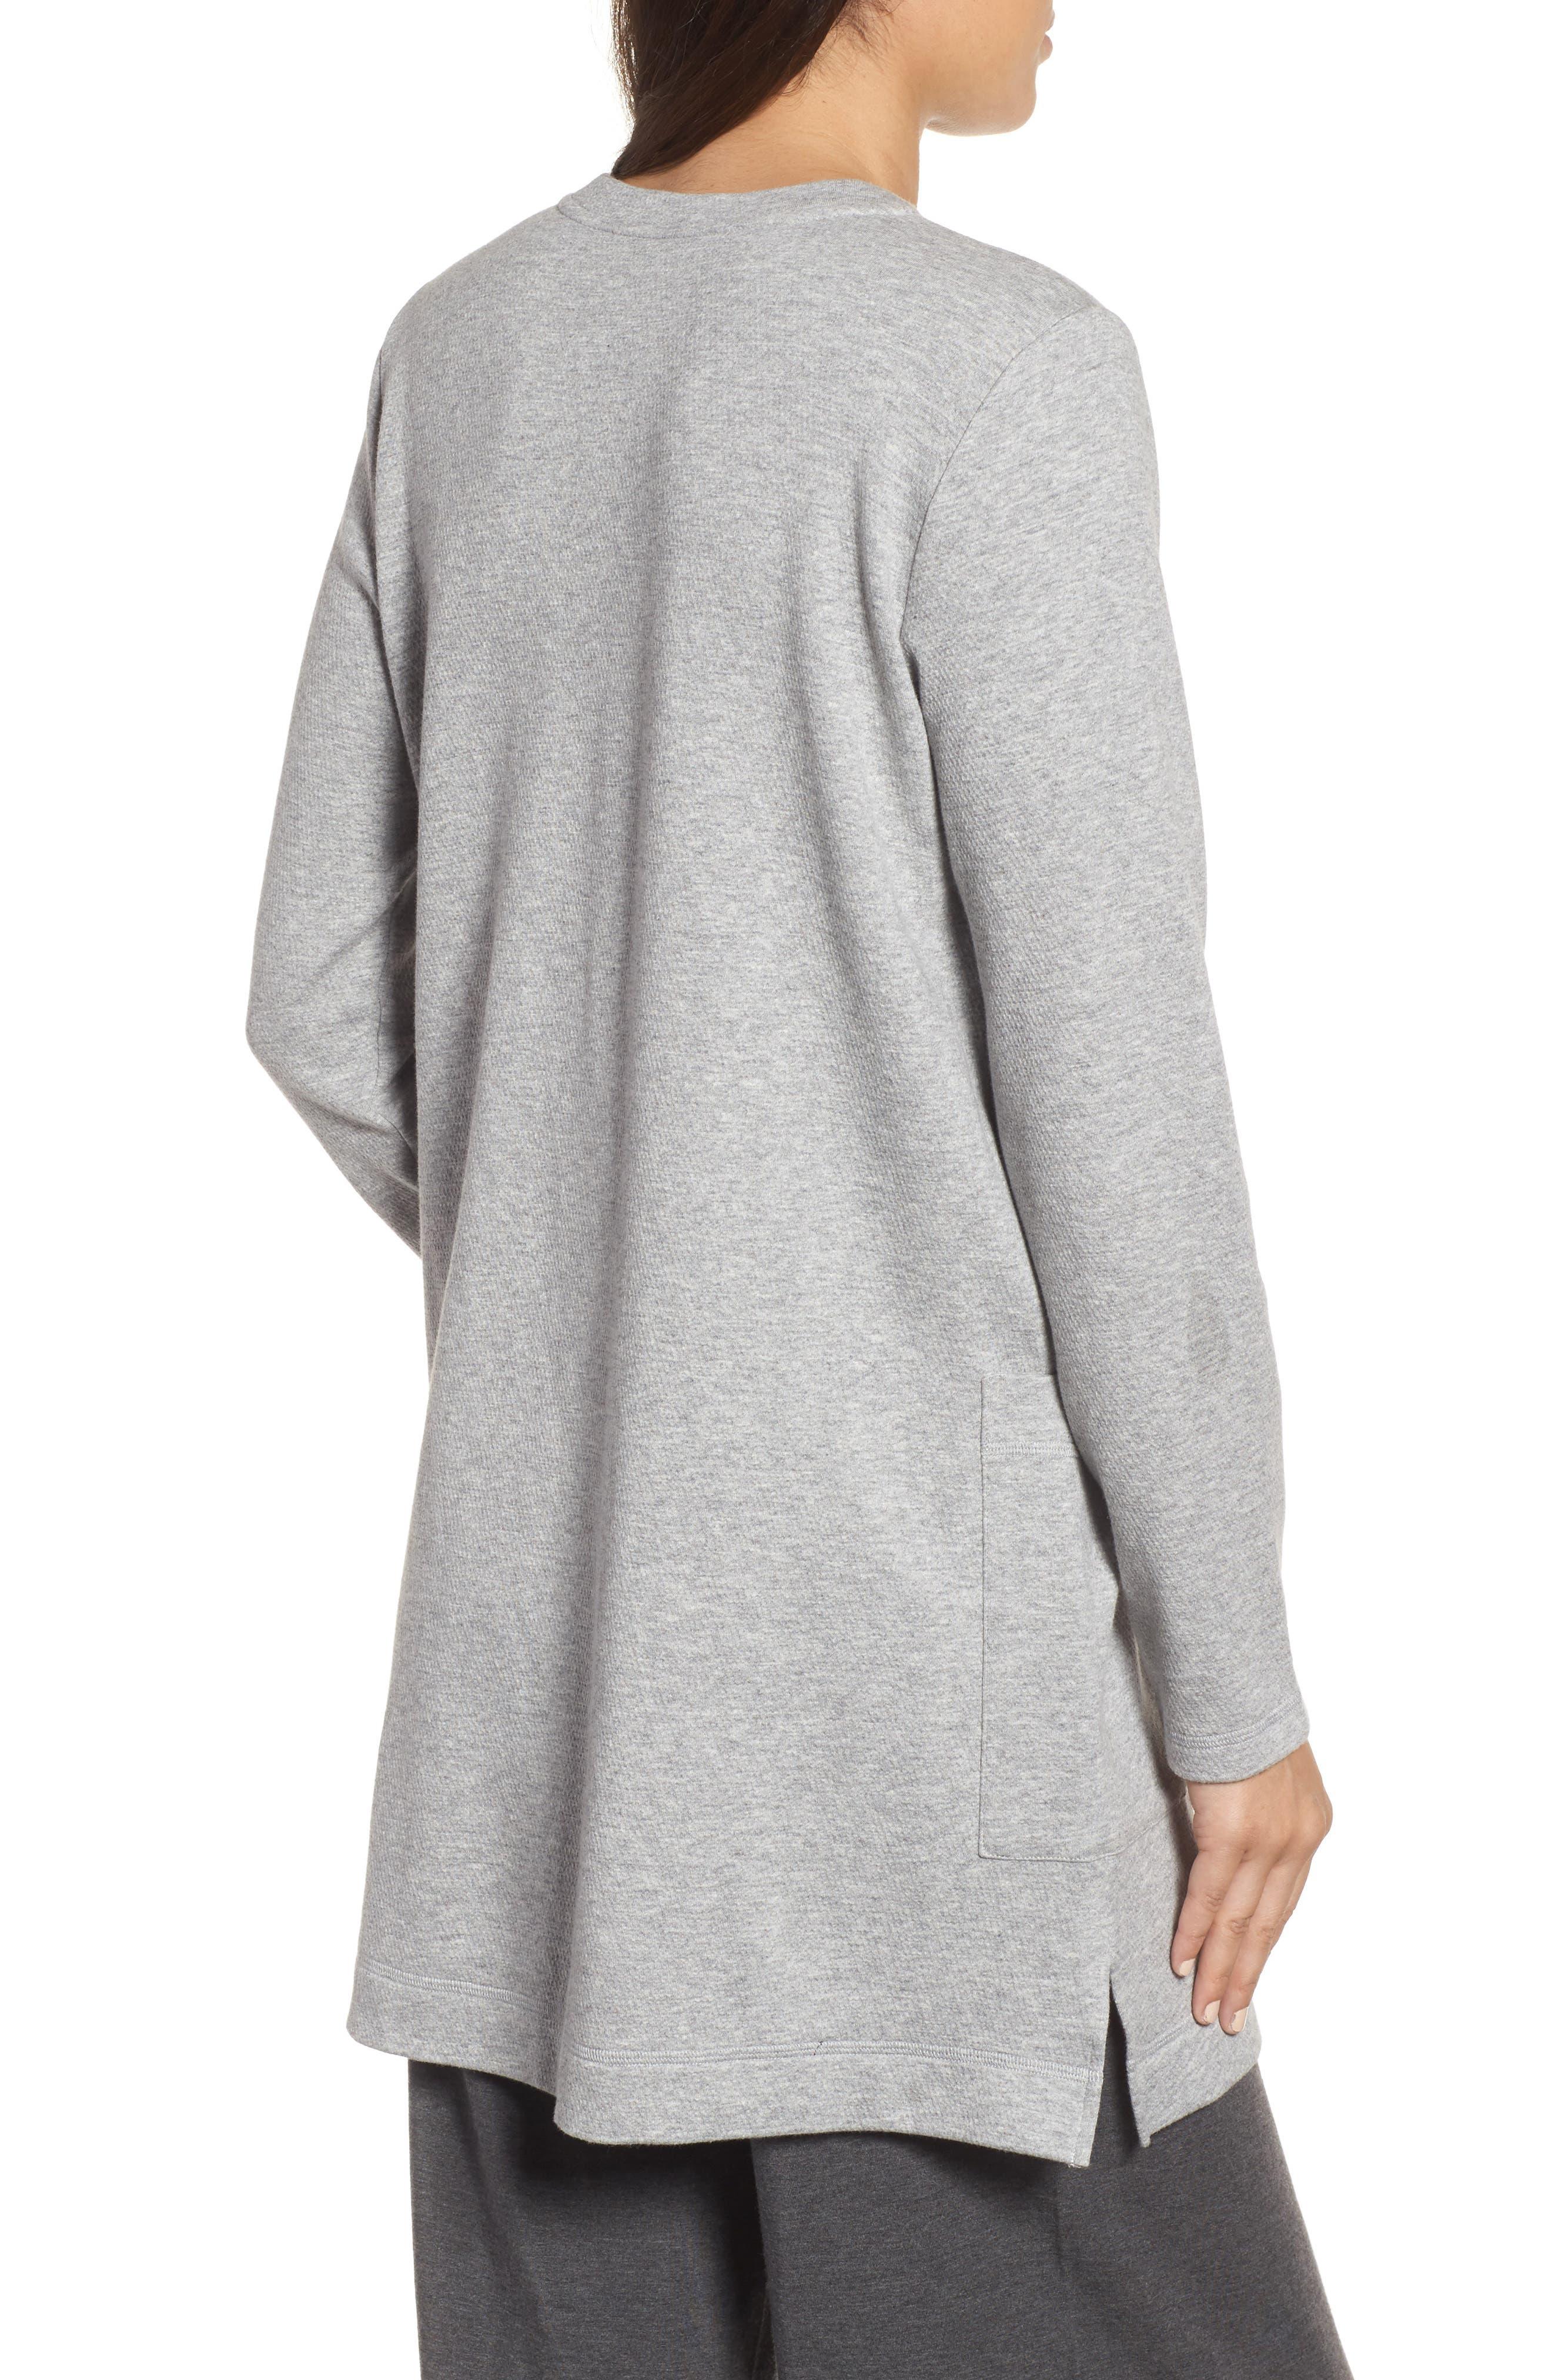 Double Knit Organic Cotton Tunic,                             Alternate thumbnail 2, color,                             022